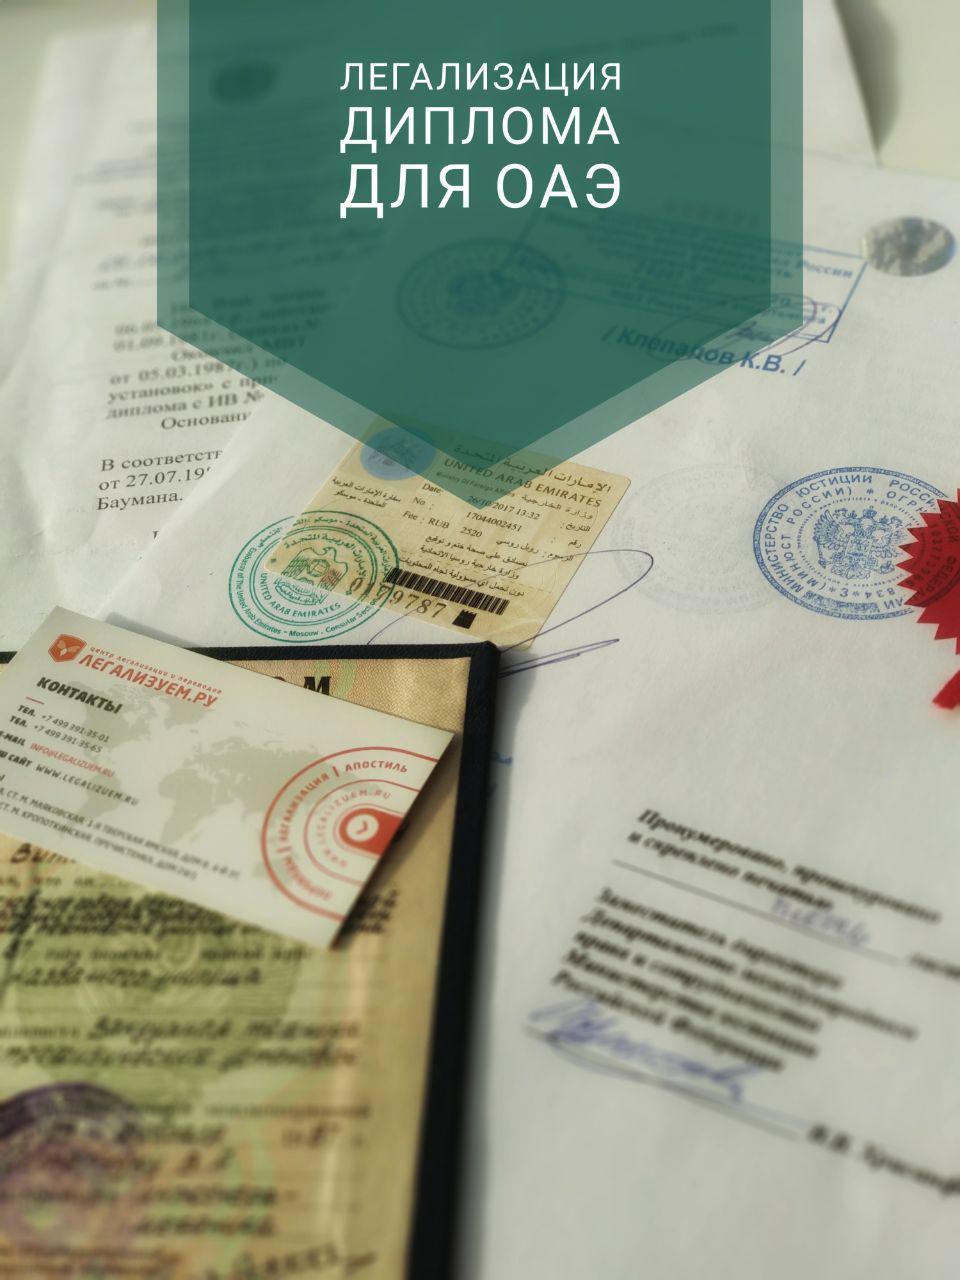 Легализация диплома для ОАЭ Легализуем Ру Легализация диплома для ОАЭ